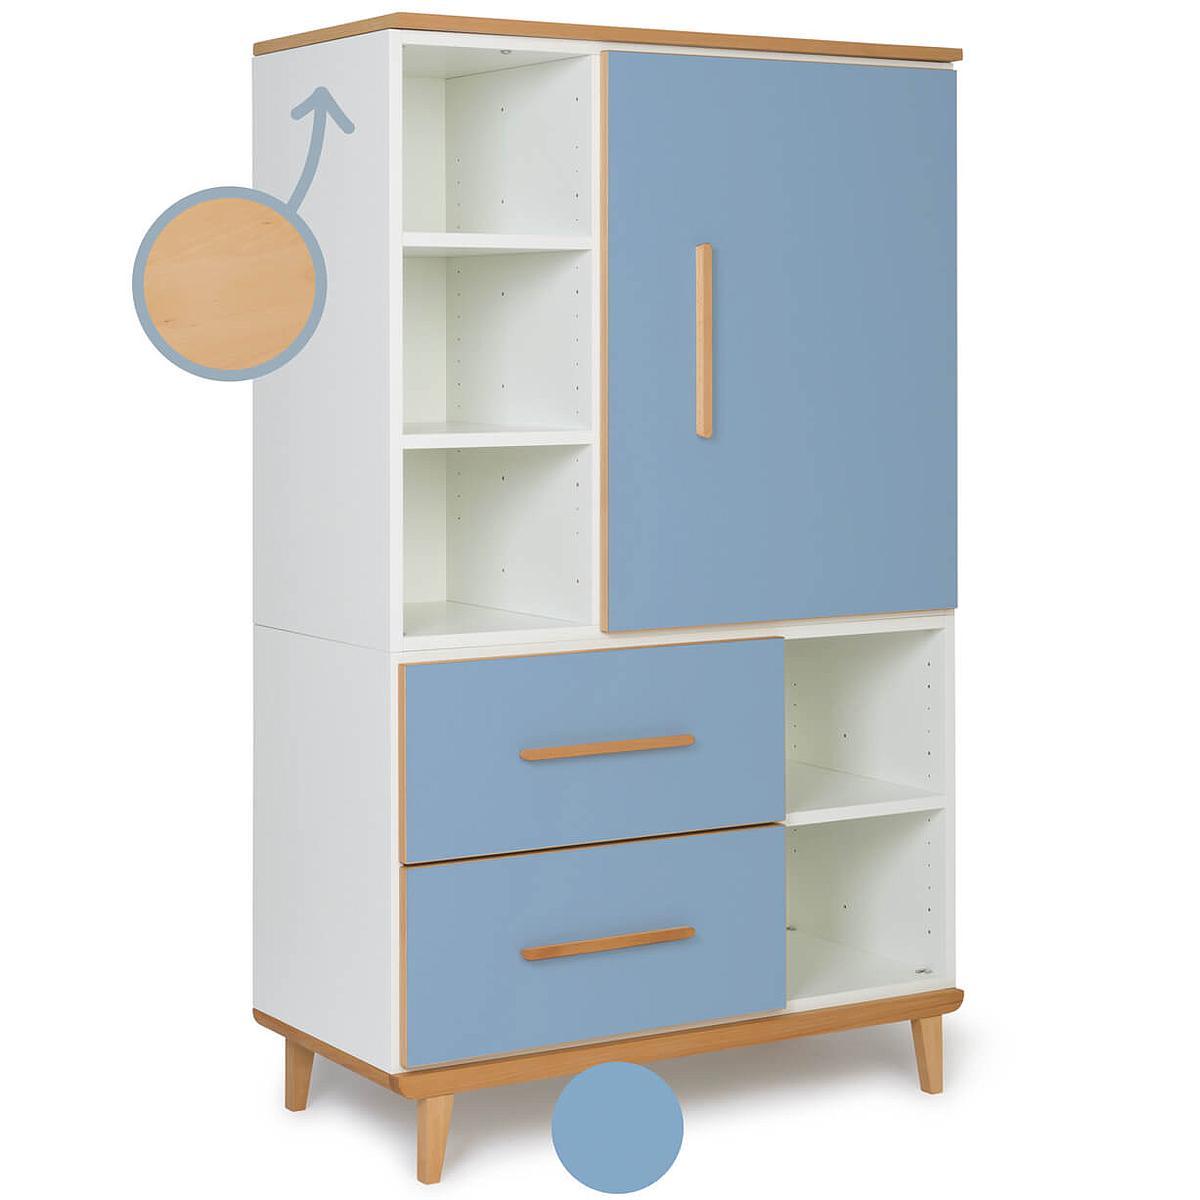 Armoire 147cm 1 porte 2 tiroirs NADO By A.K. capri blue